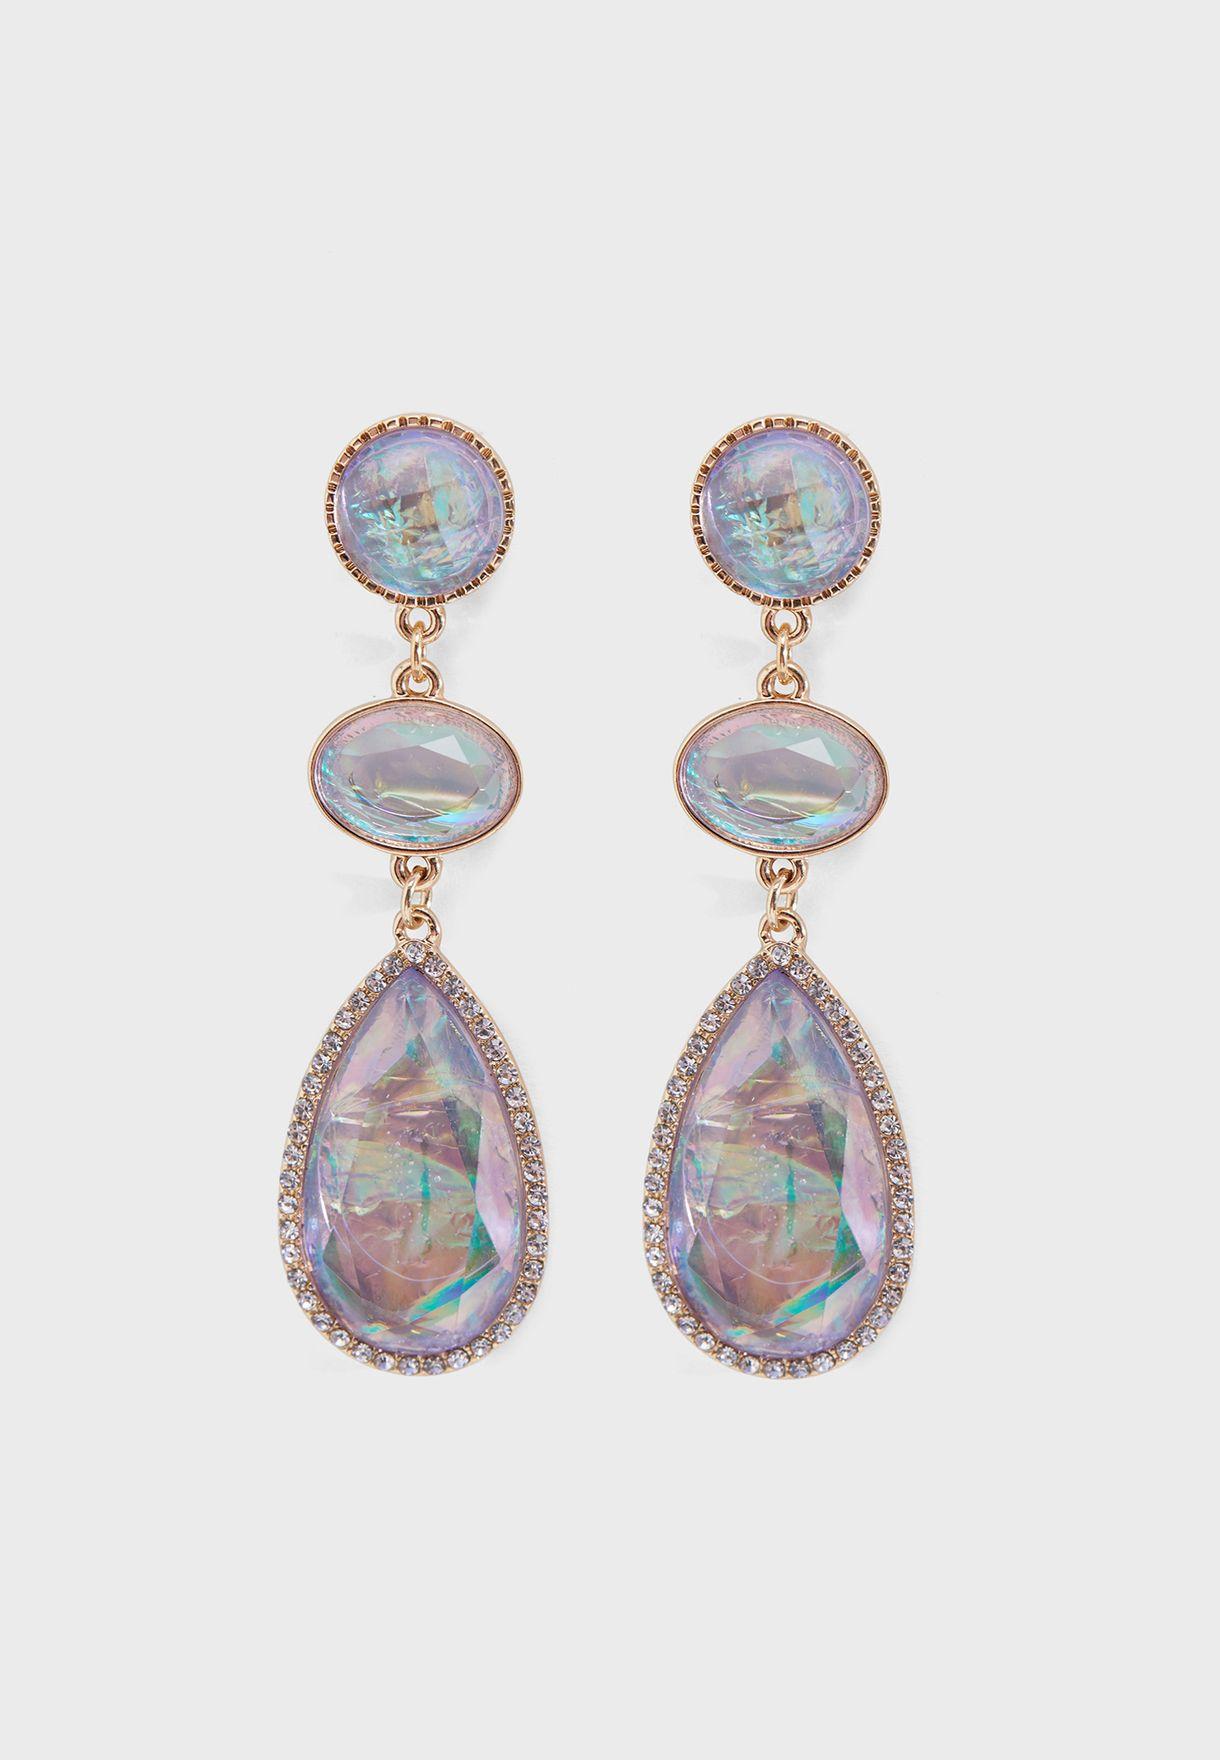 26efbd24d Shop Forever 21 multicolor Iridescent Faux Gem & Rhinestone Drop  Earrings 329381 for Women in Bahrain - 20008AC58FXP